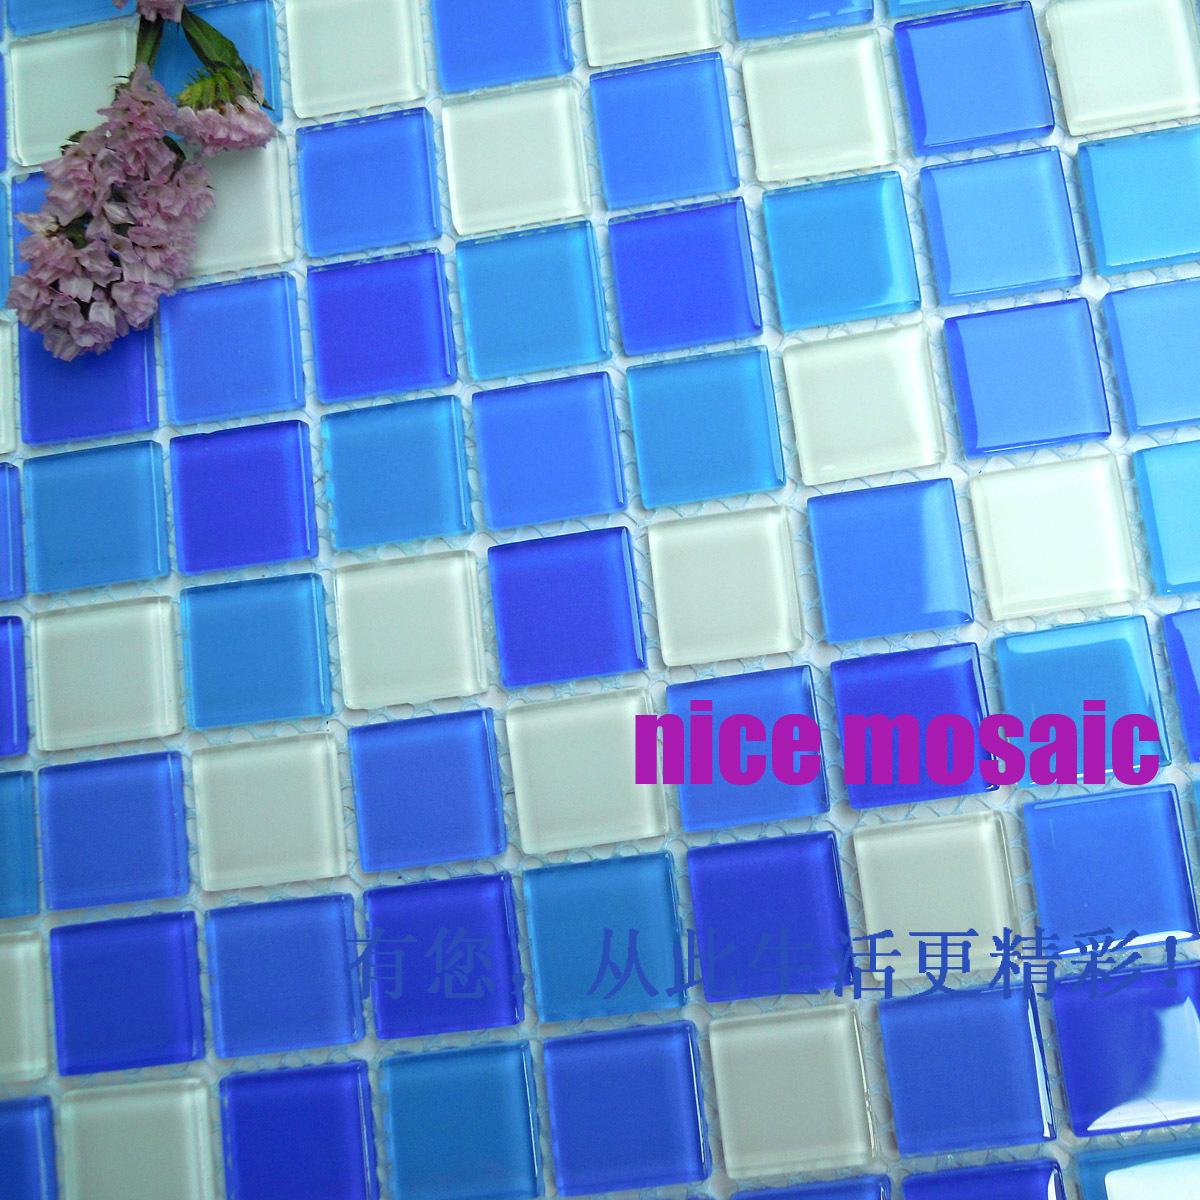 Bleu cristal mosa que de verre salle de bains fond for Carreau de verre salle de bain